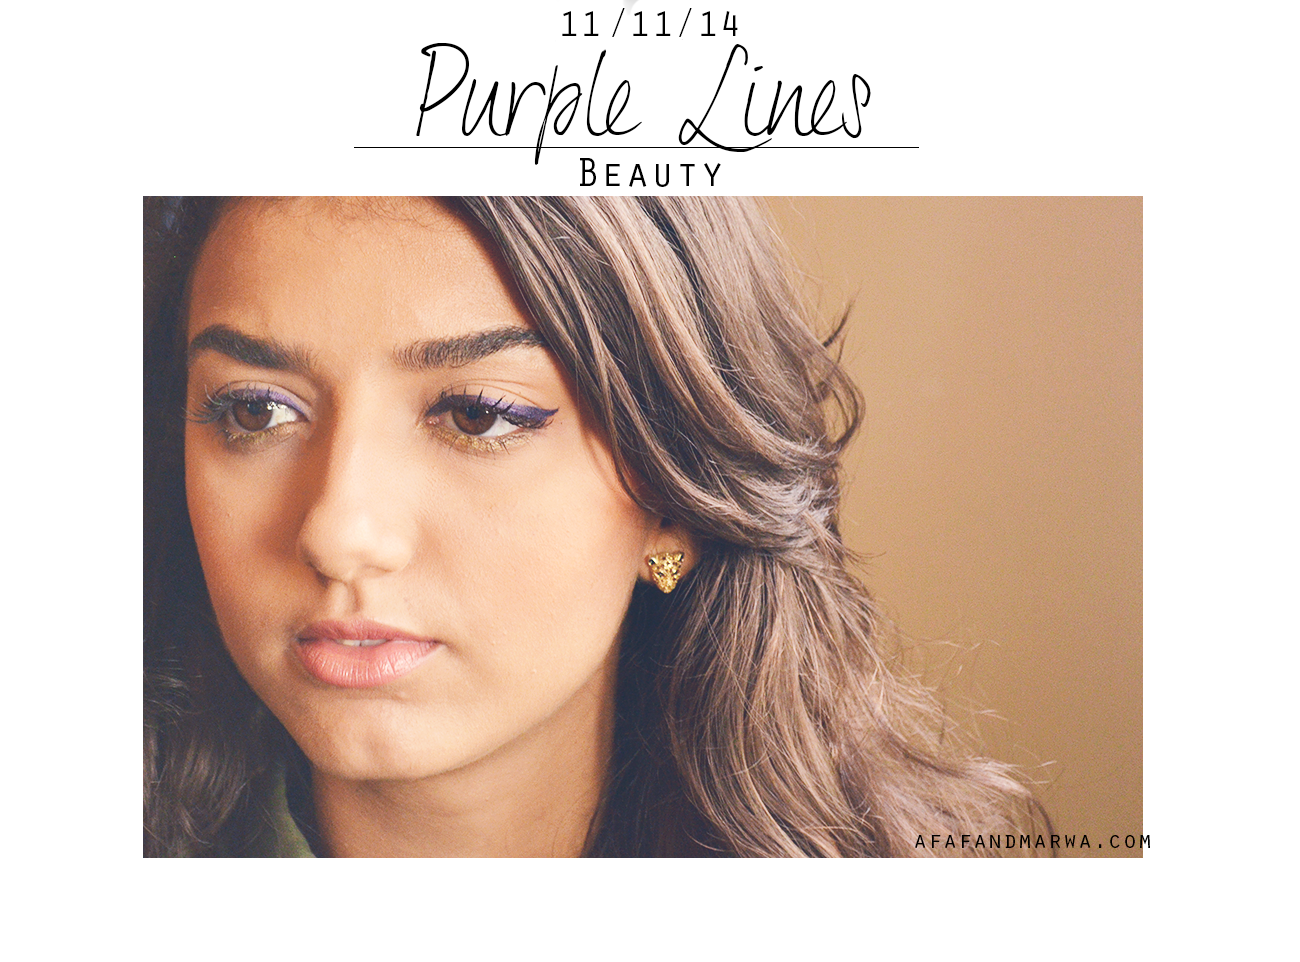 make up for fall produits pb cosmetics maroc avis produits pb cosmetics blush pb cosmetics orange revue review